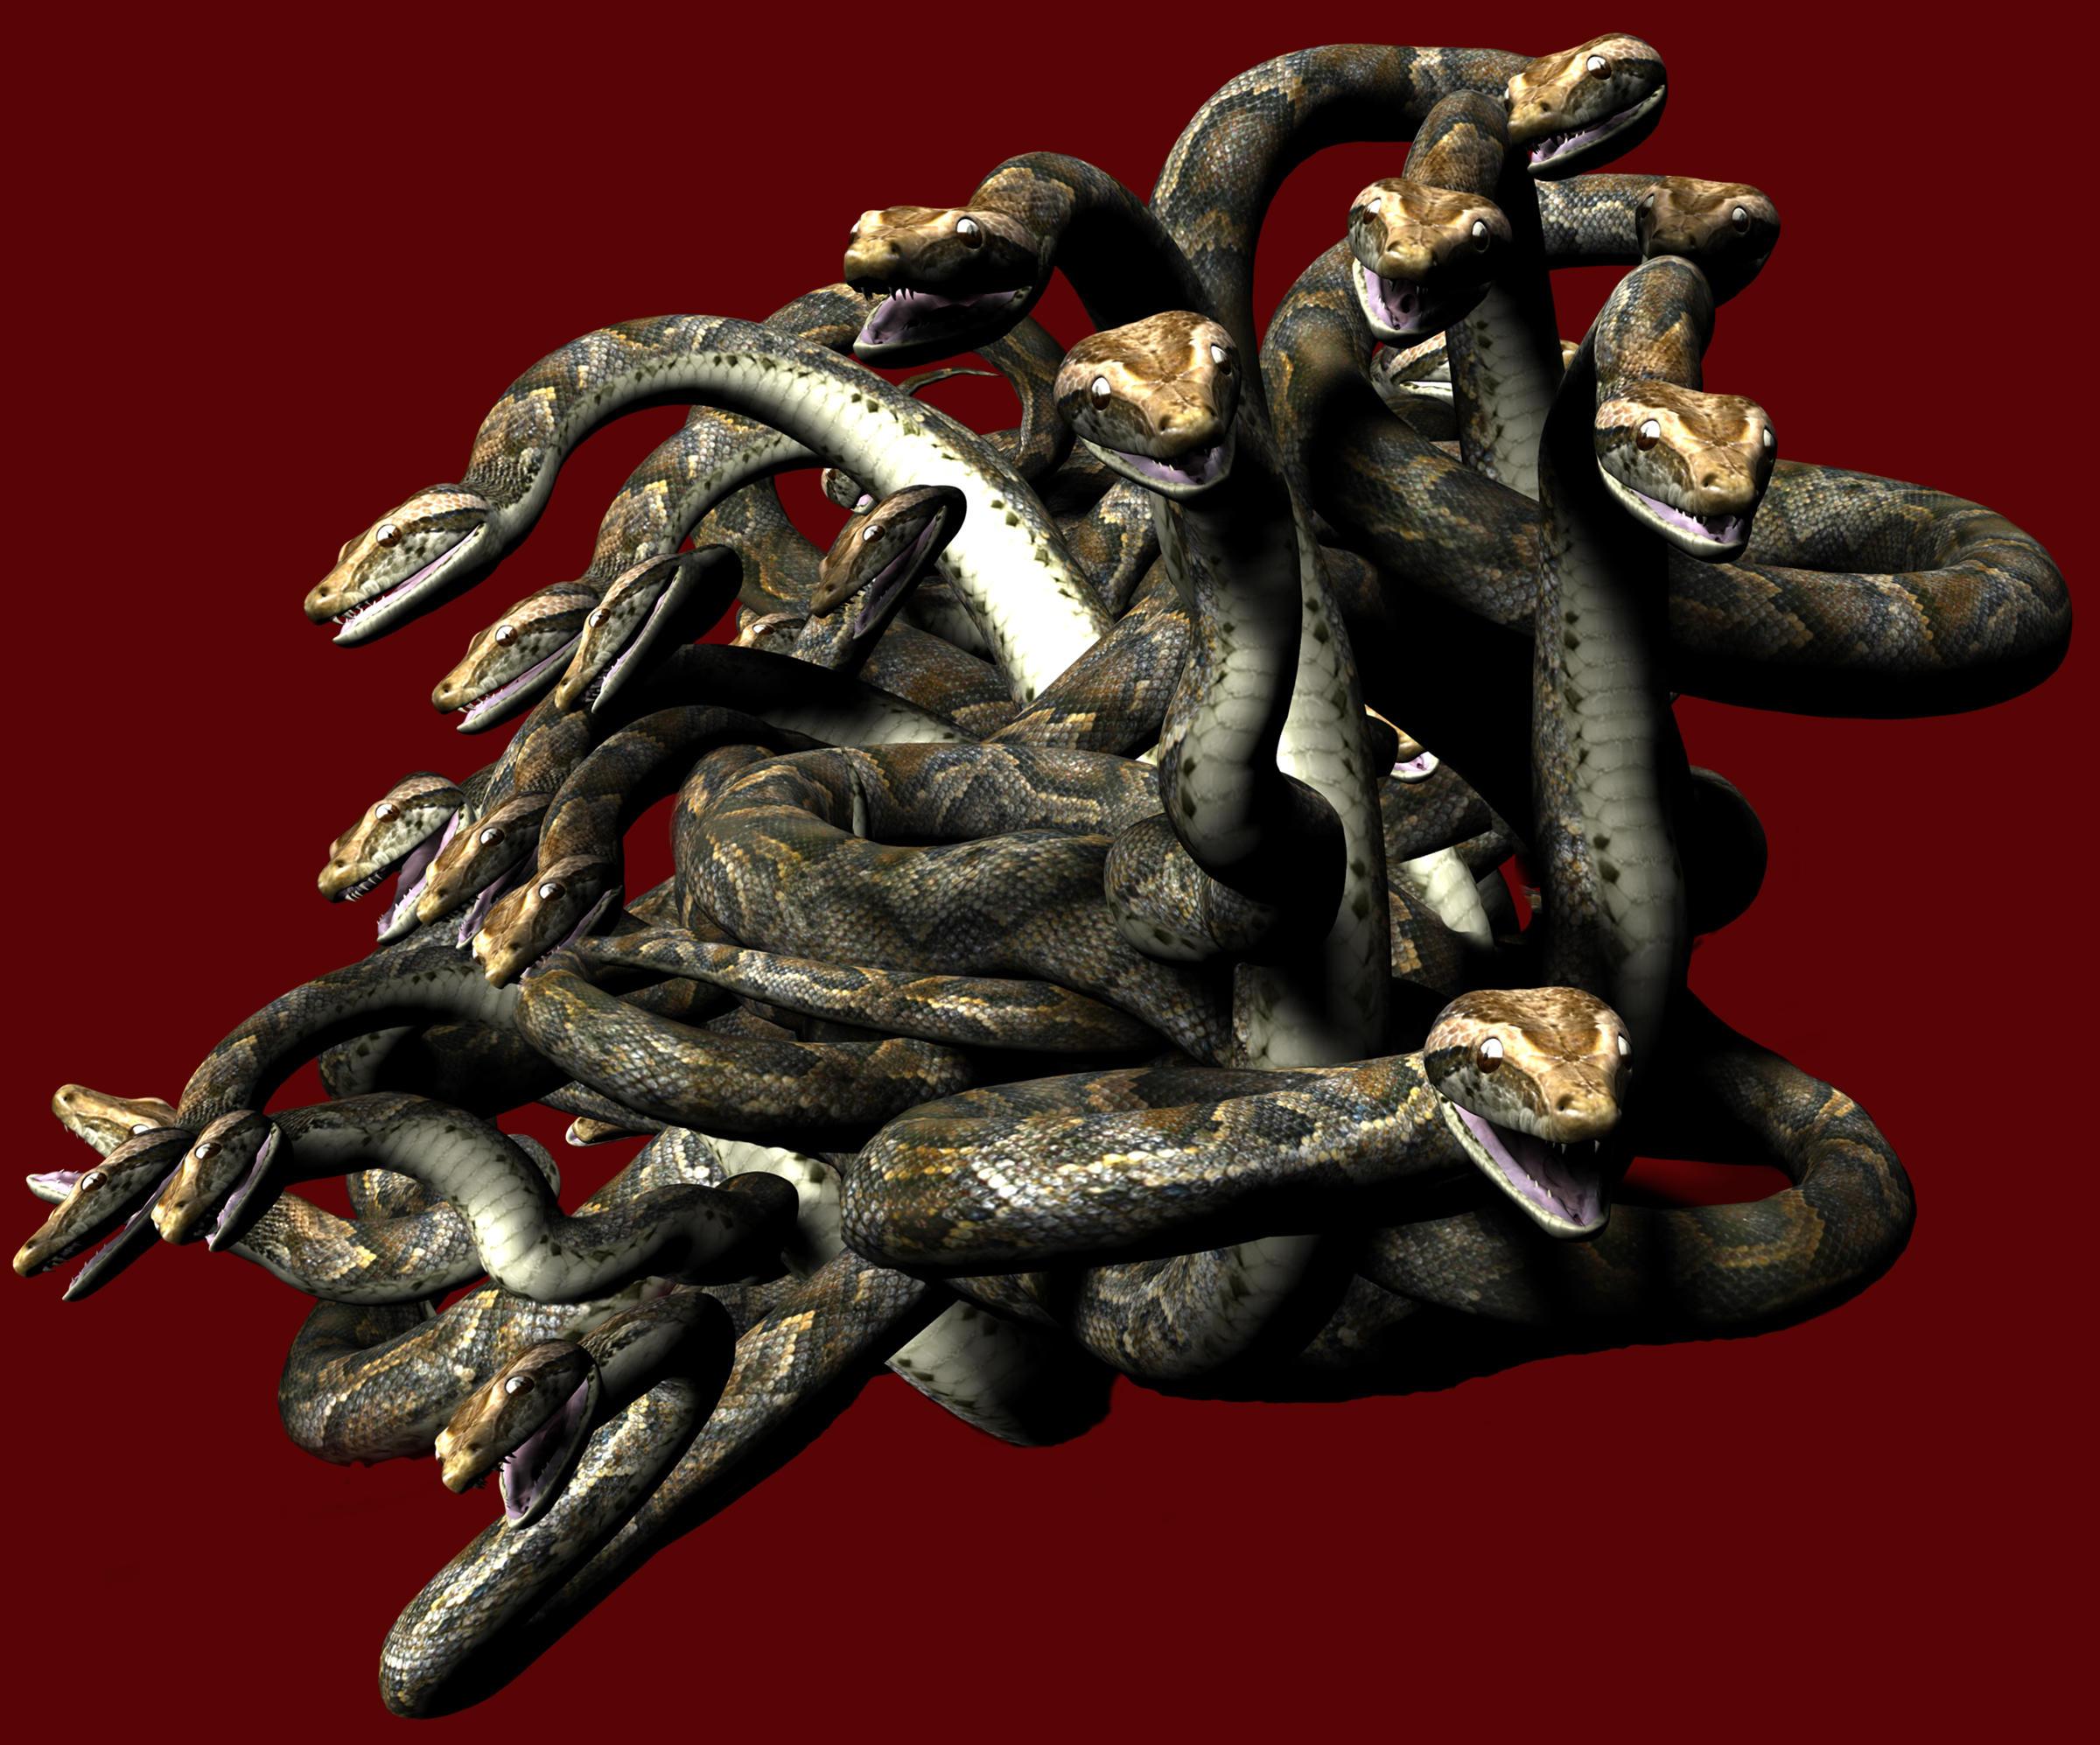 Medusa - Snake Wig 1 by markopolio-stock